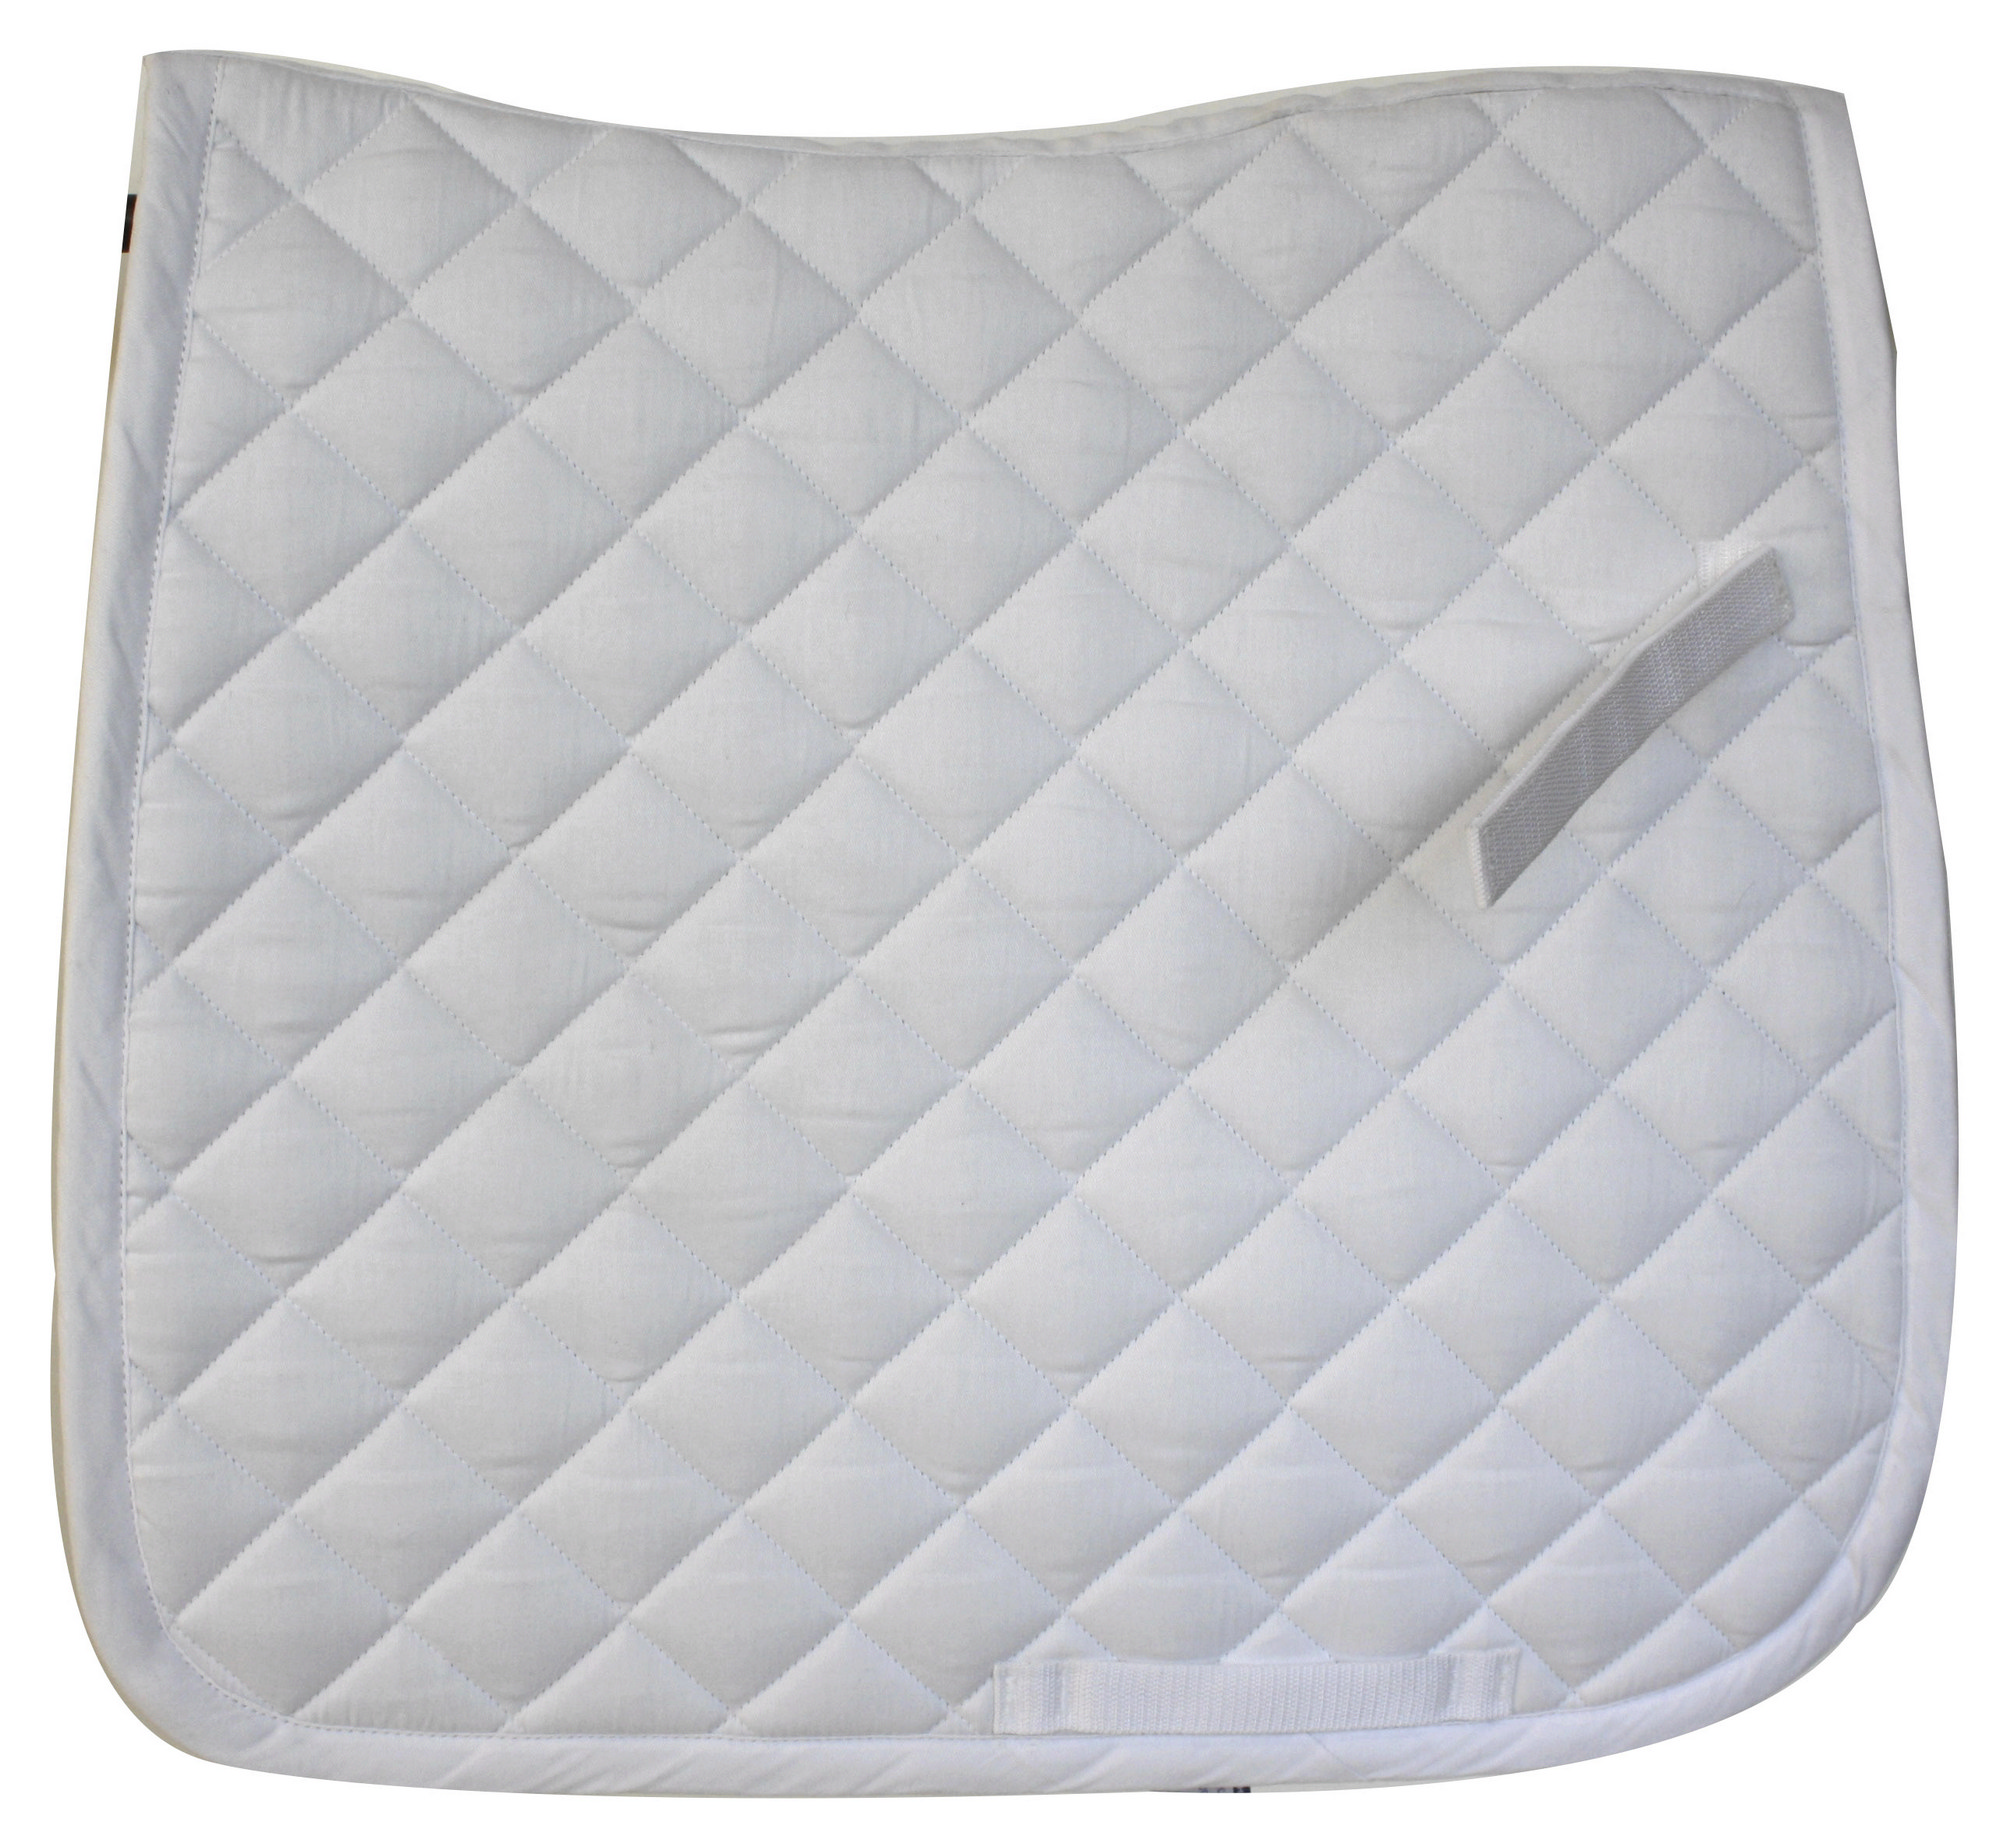 Lami-Cell Basic Dressage Saddle Pad